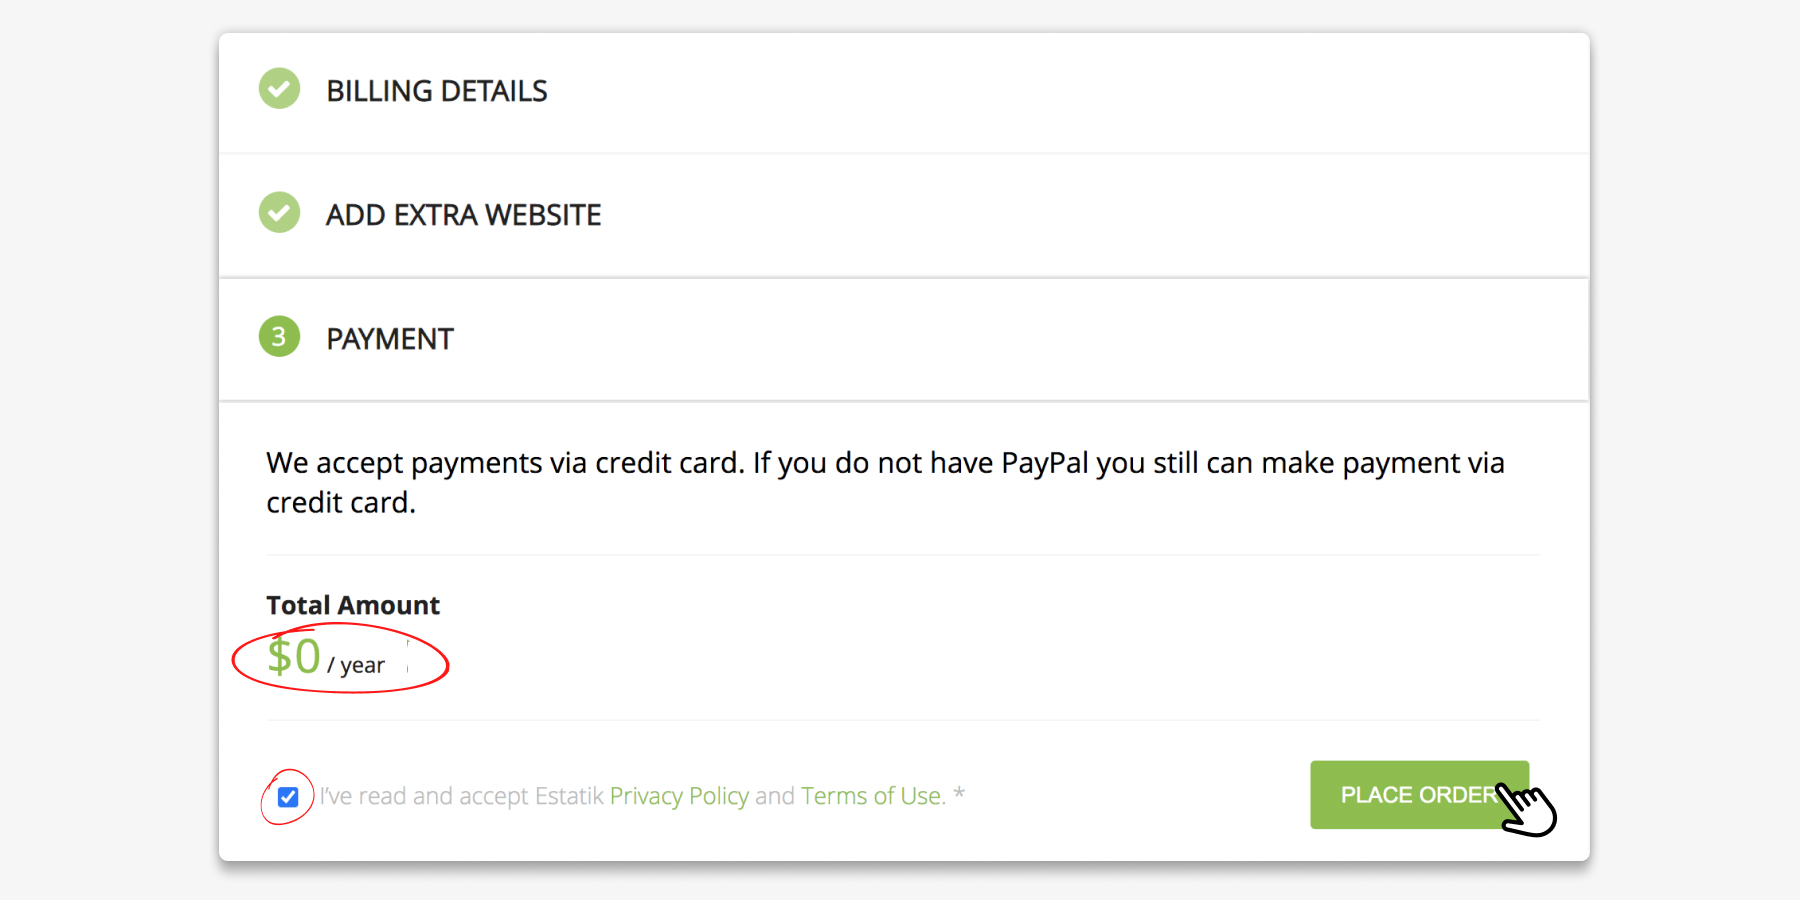 1.3_Payment_1.jpg